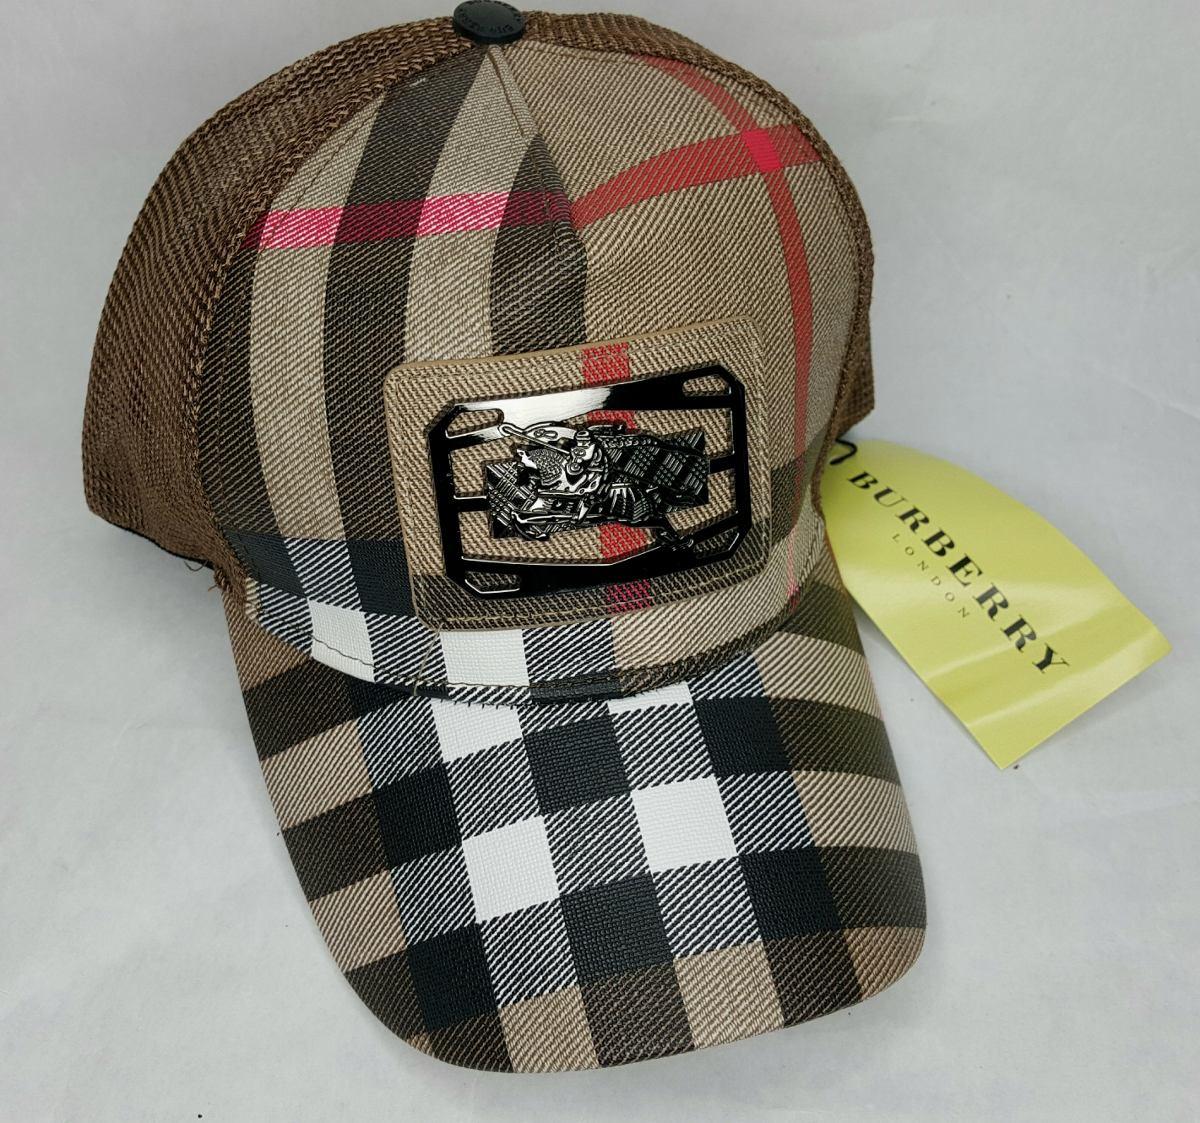 ee653ff12b481 gorra gorras burberry ajustable unisex cap moda. Cargando zoom... gorra  gorras moda. Cargando zoom.